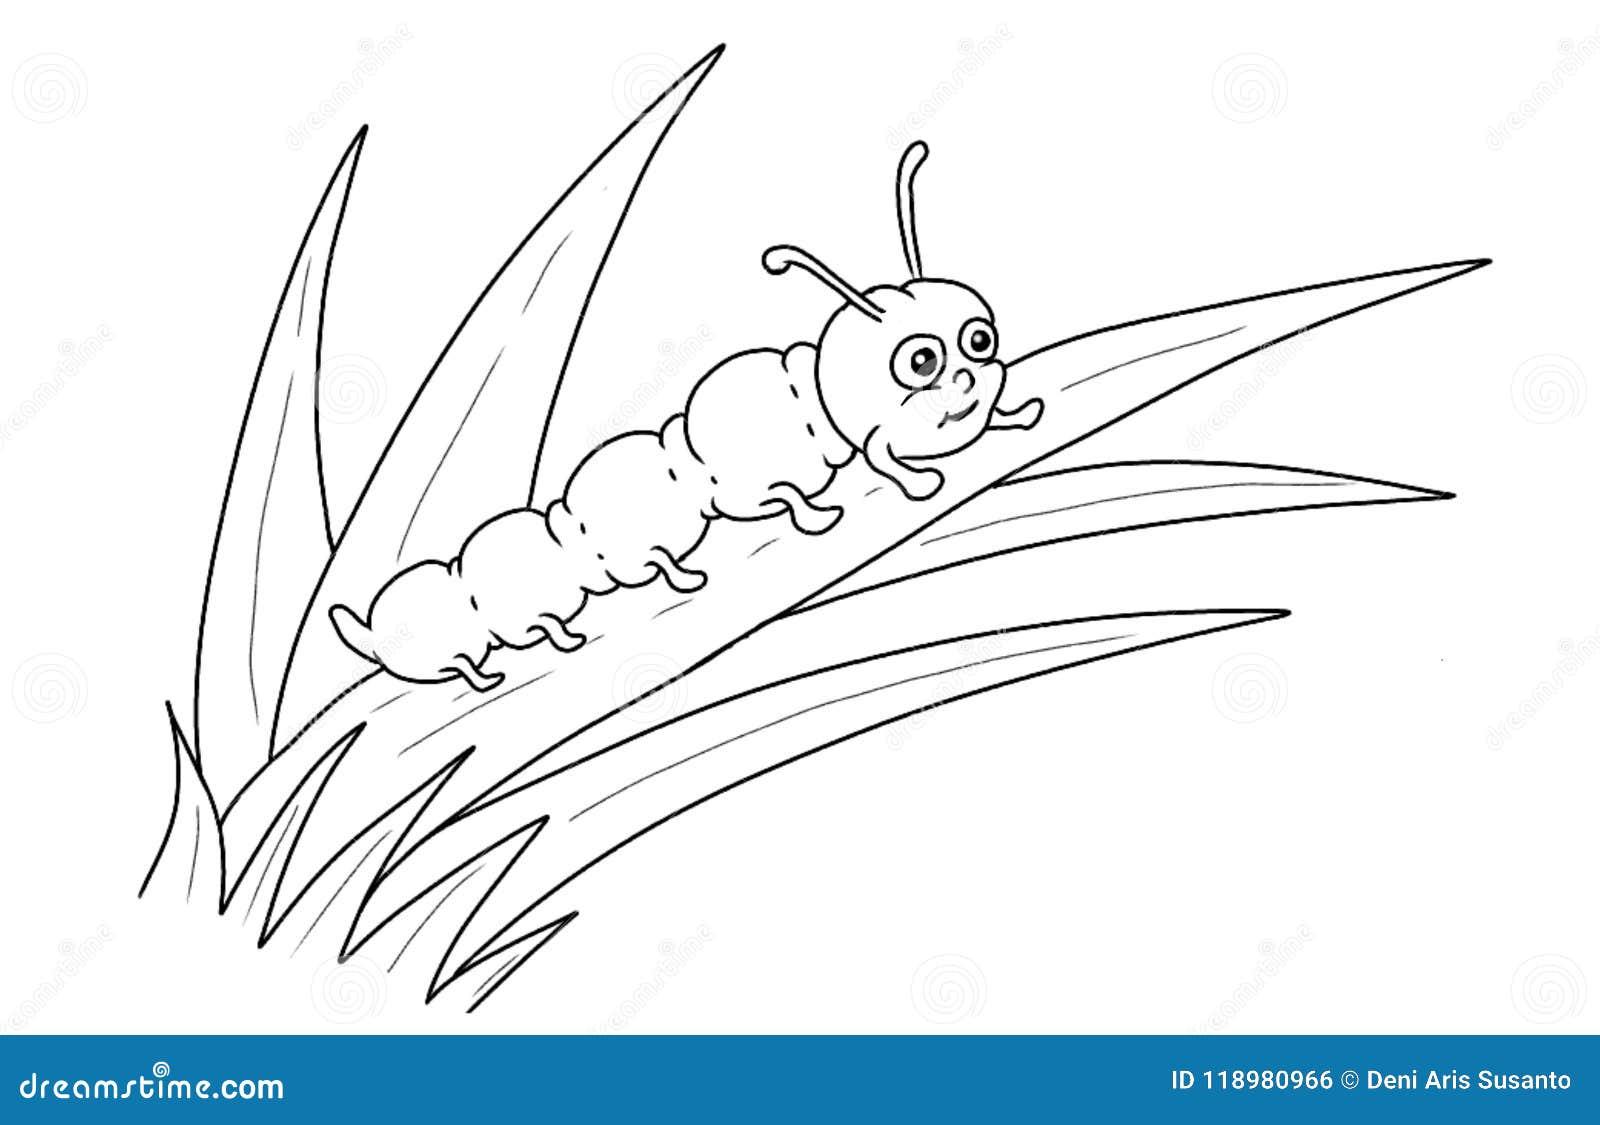 - Caterpillar Cartoon Colouring Page Stock Illustration